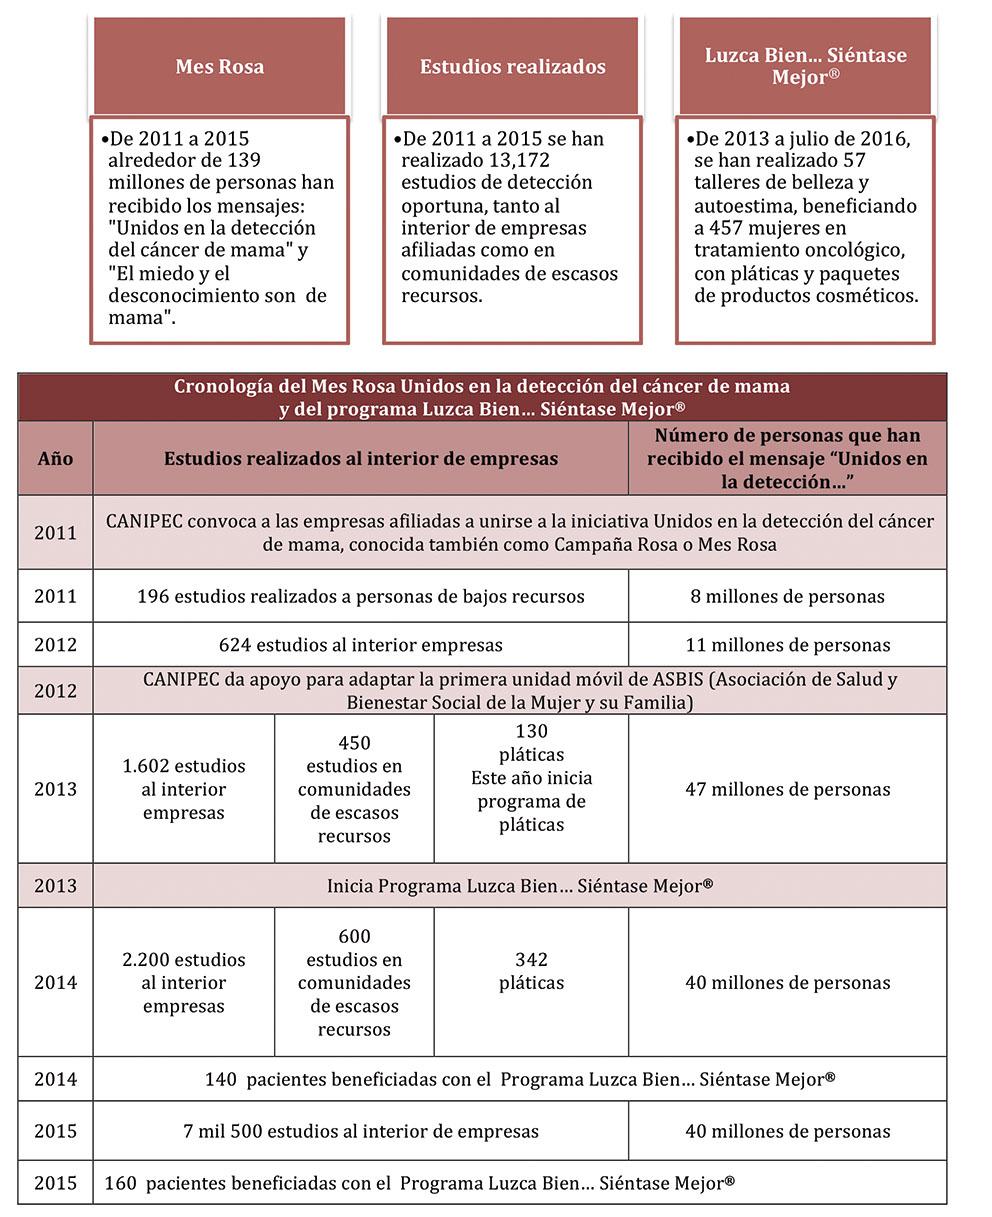 Microsoft Word - ProgramaRosa-MacroEco.docx